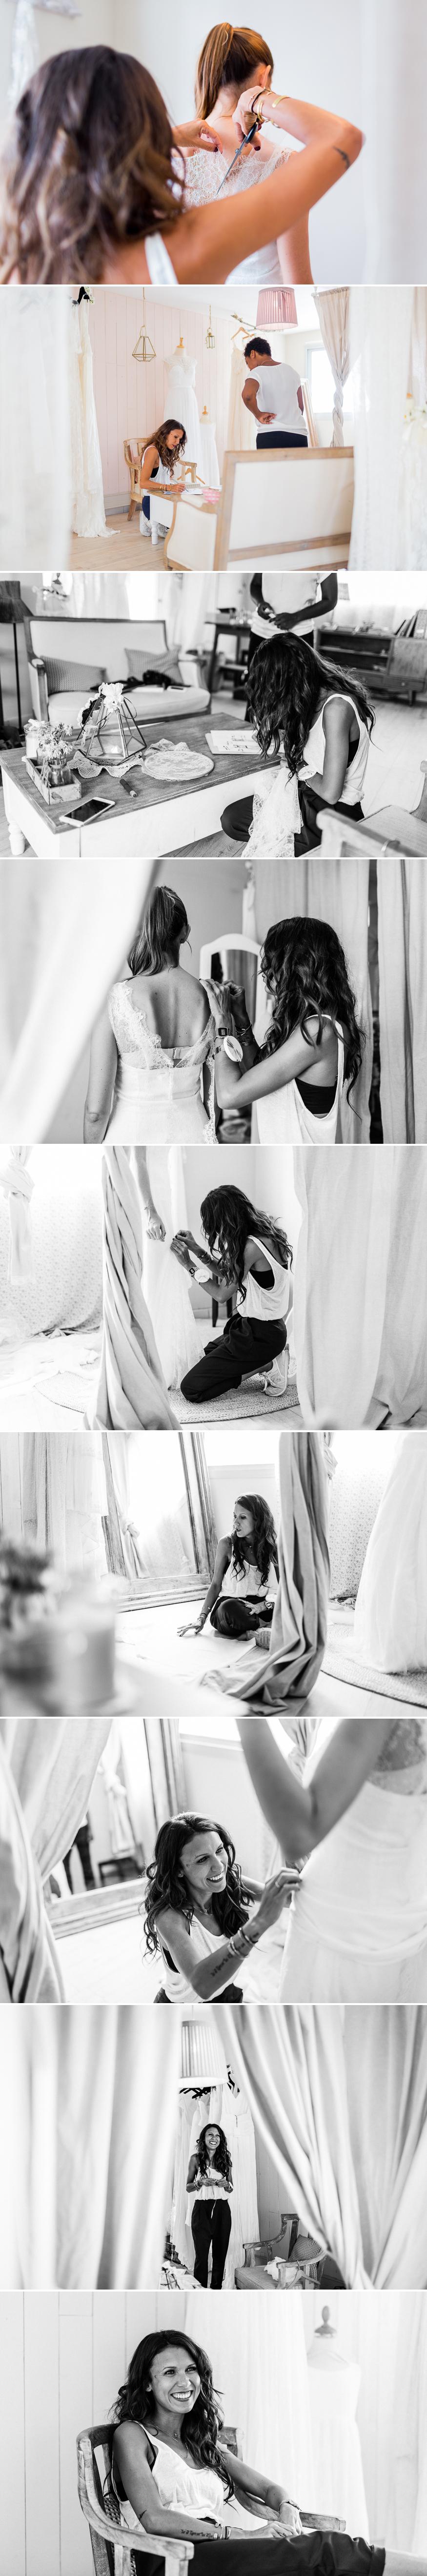 photographe mariage ile de la reunion 974